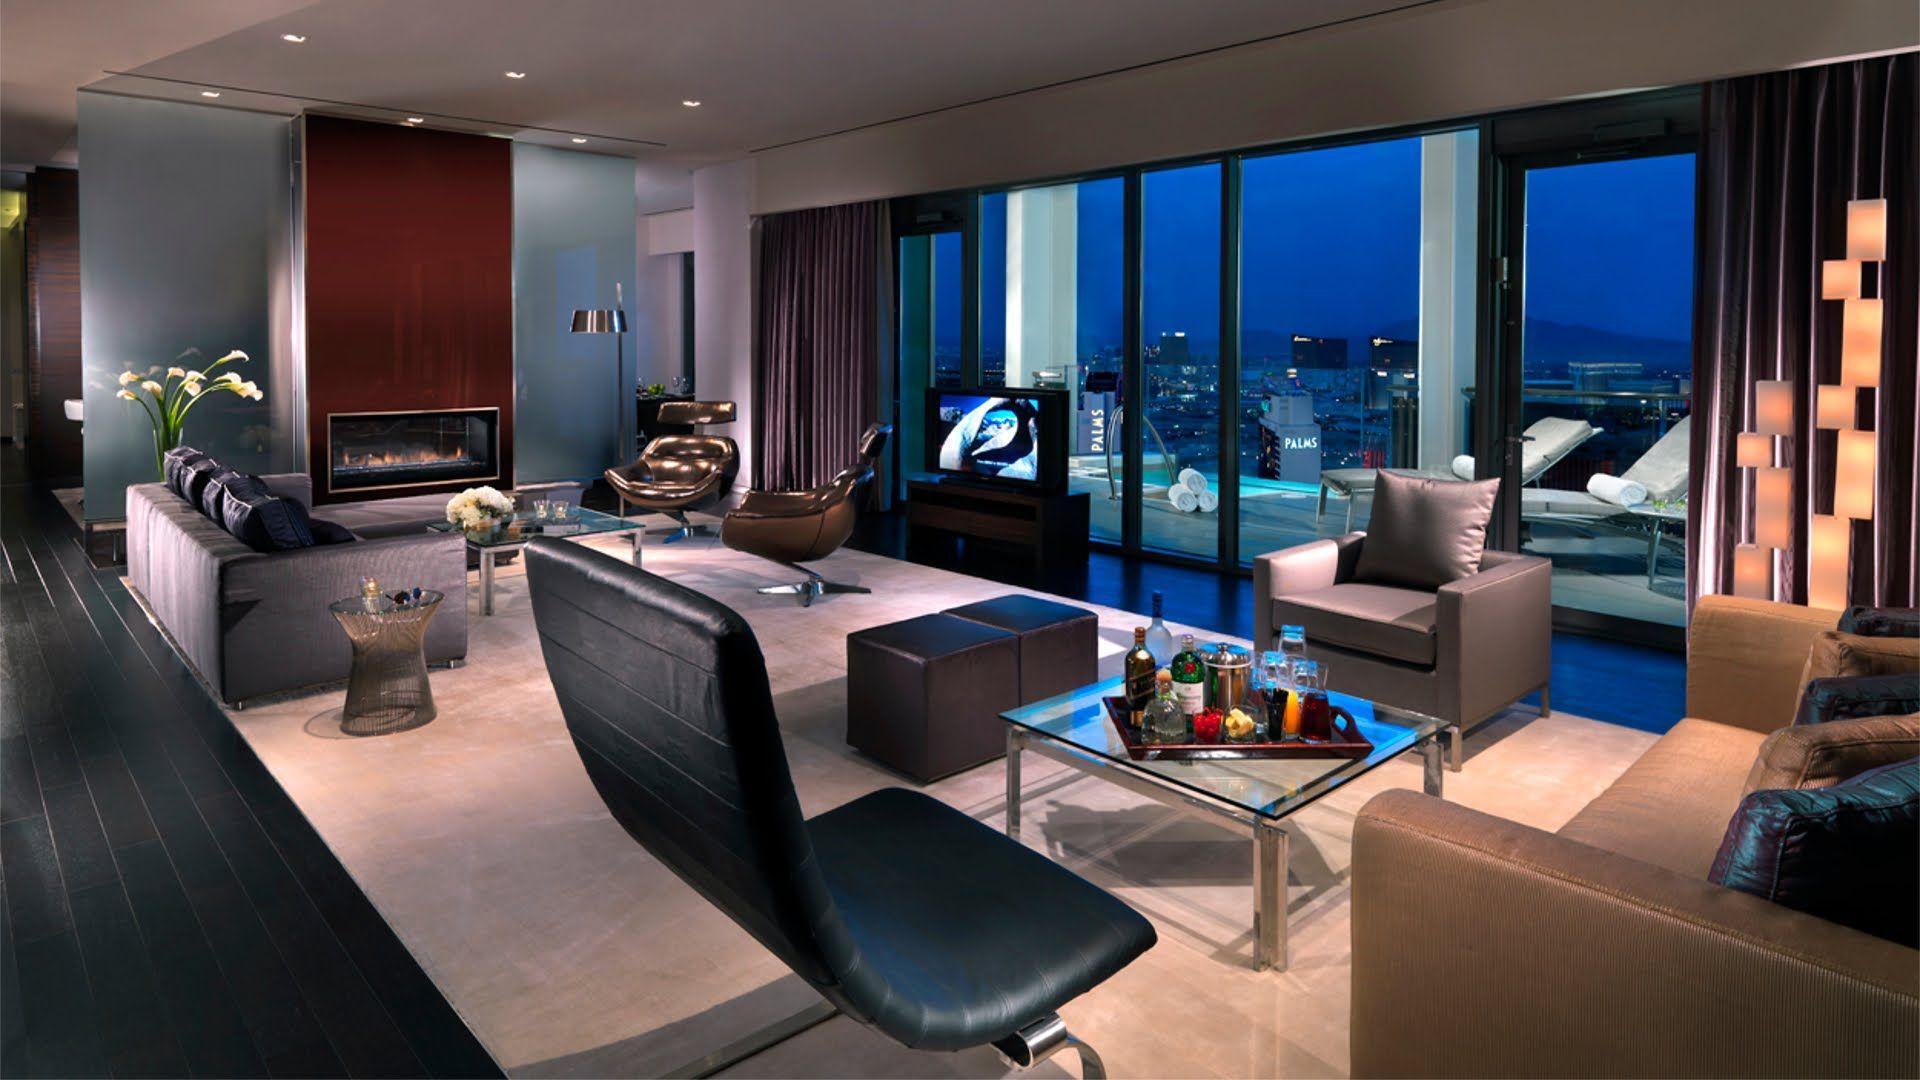 Tour of Penthouse Villa Palms Hotel Casino Las Vegas